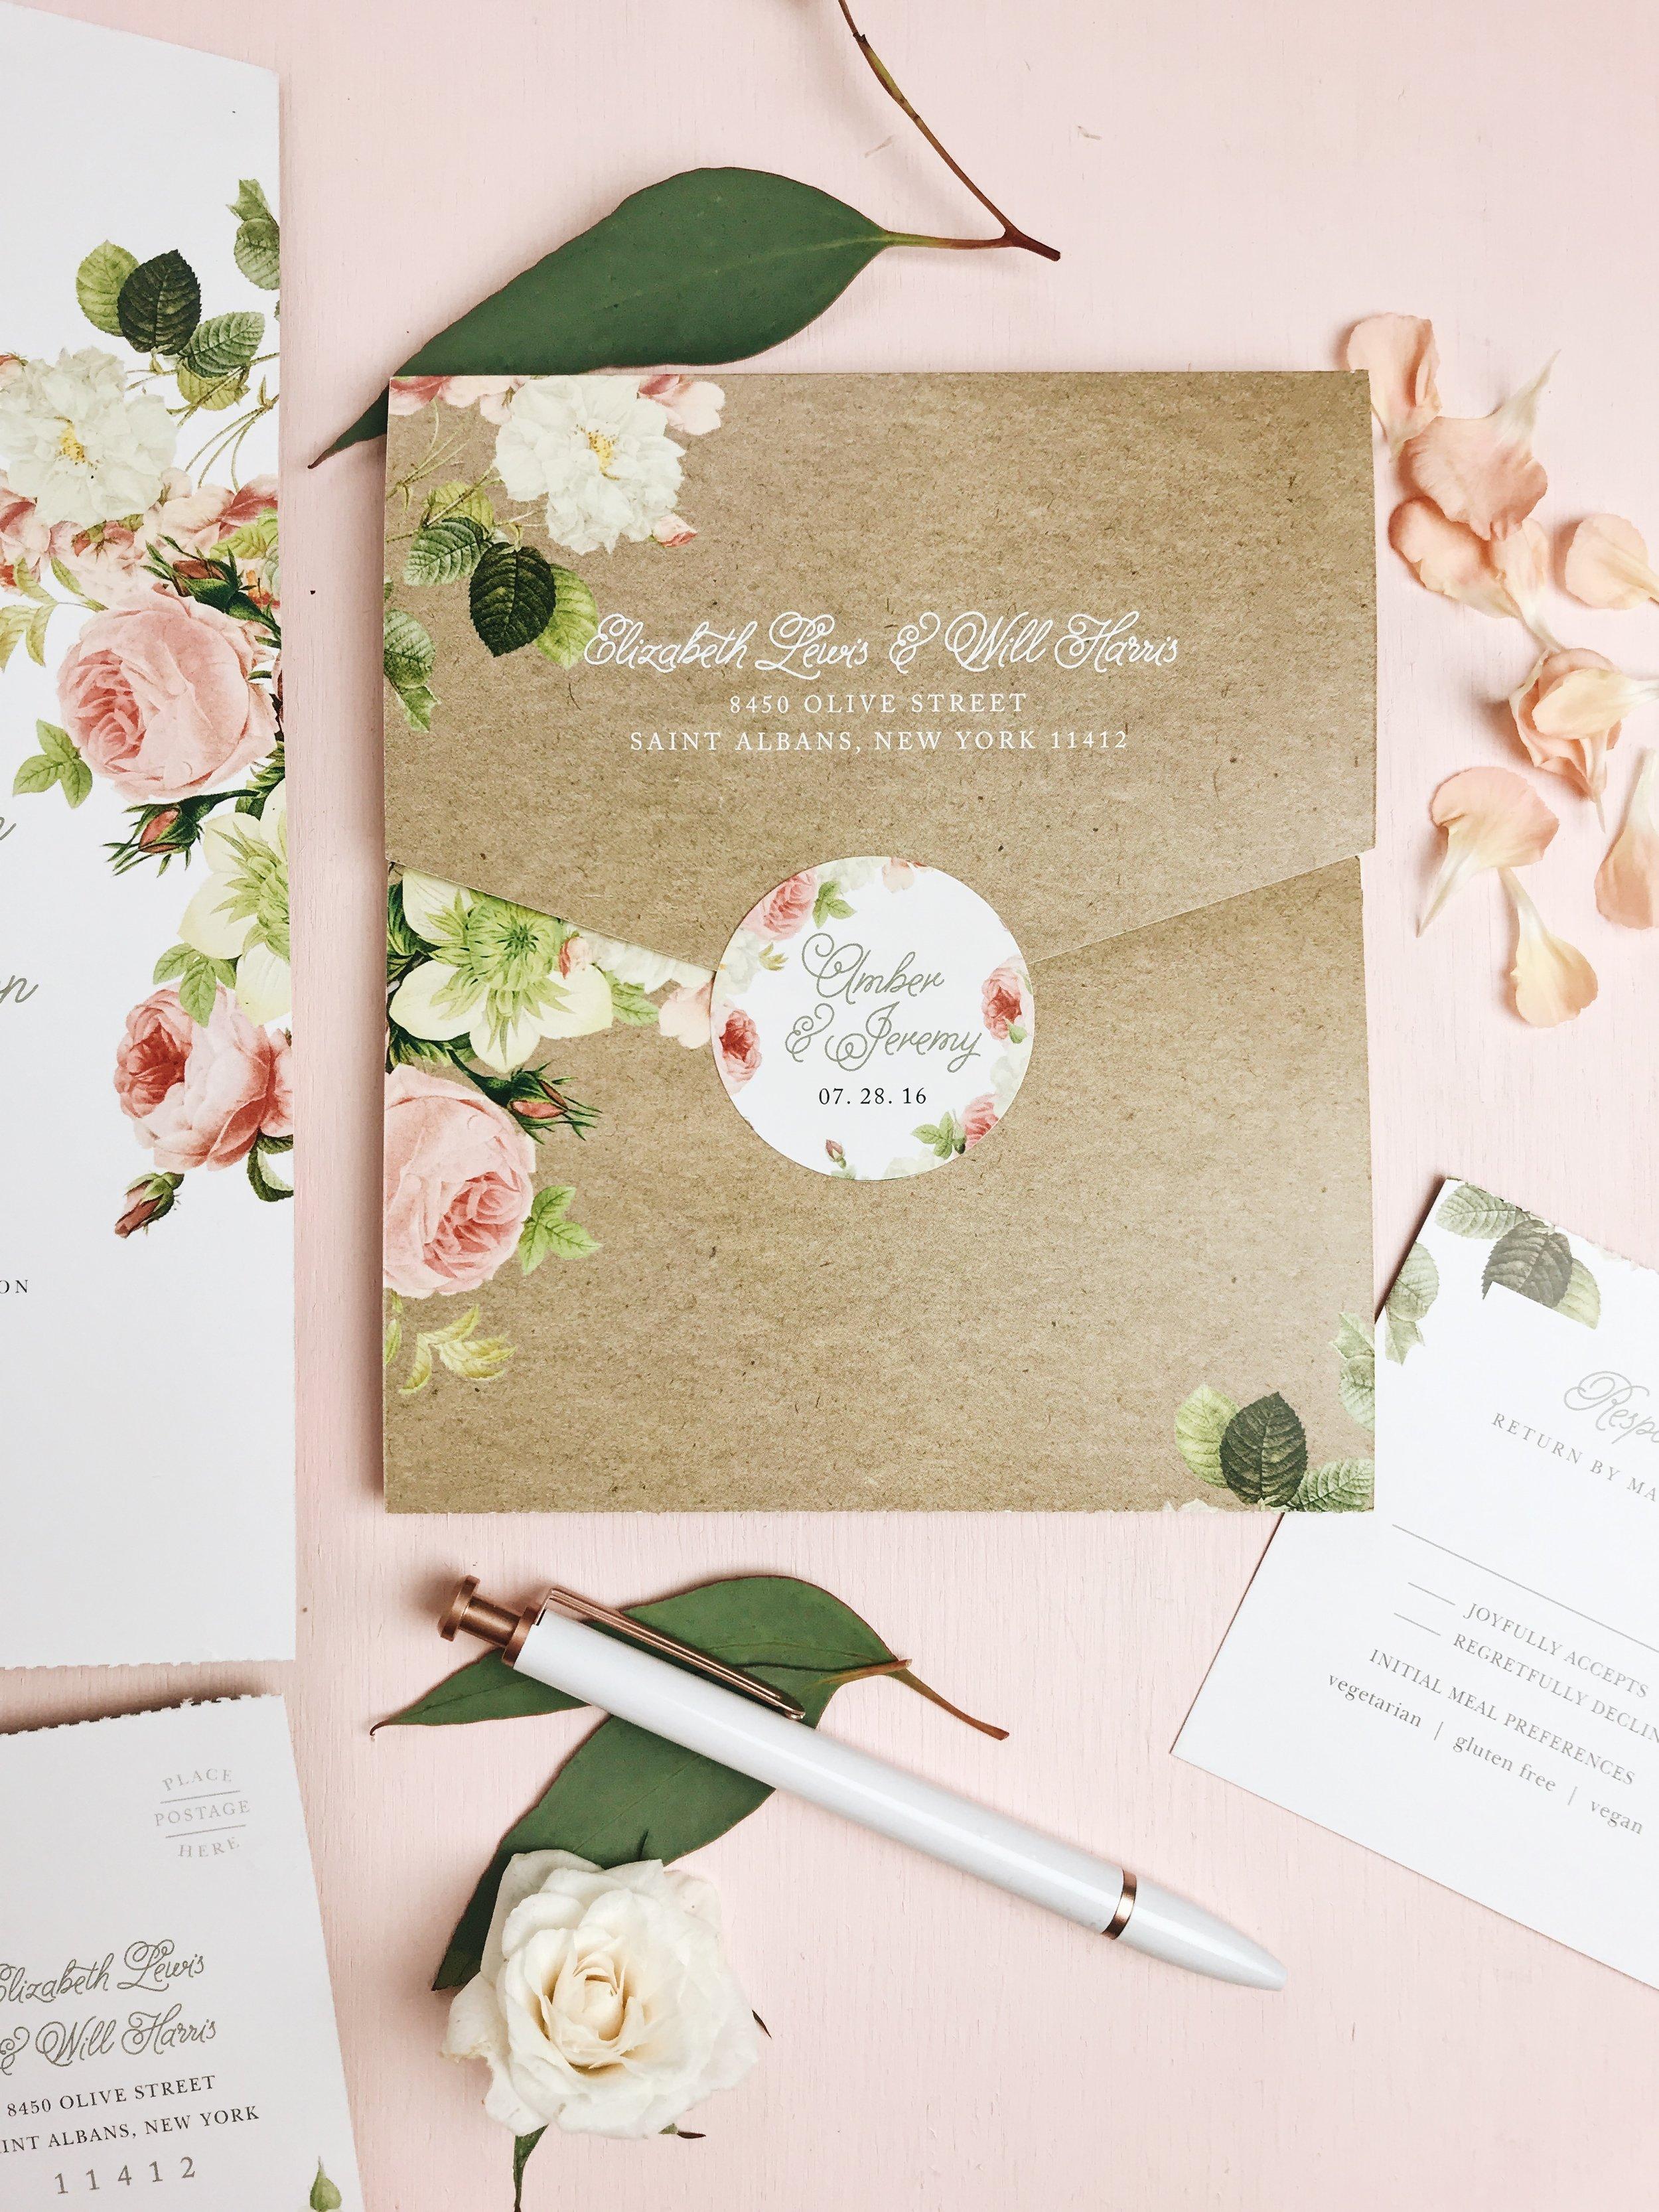 Basic_Invite_Wedding_Suites_22.jpg